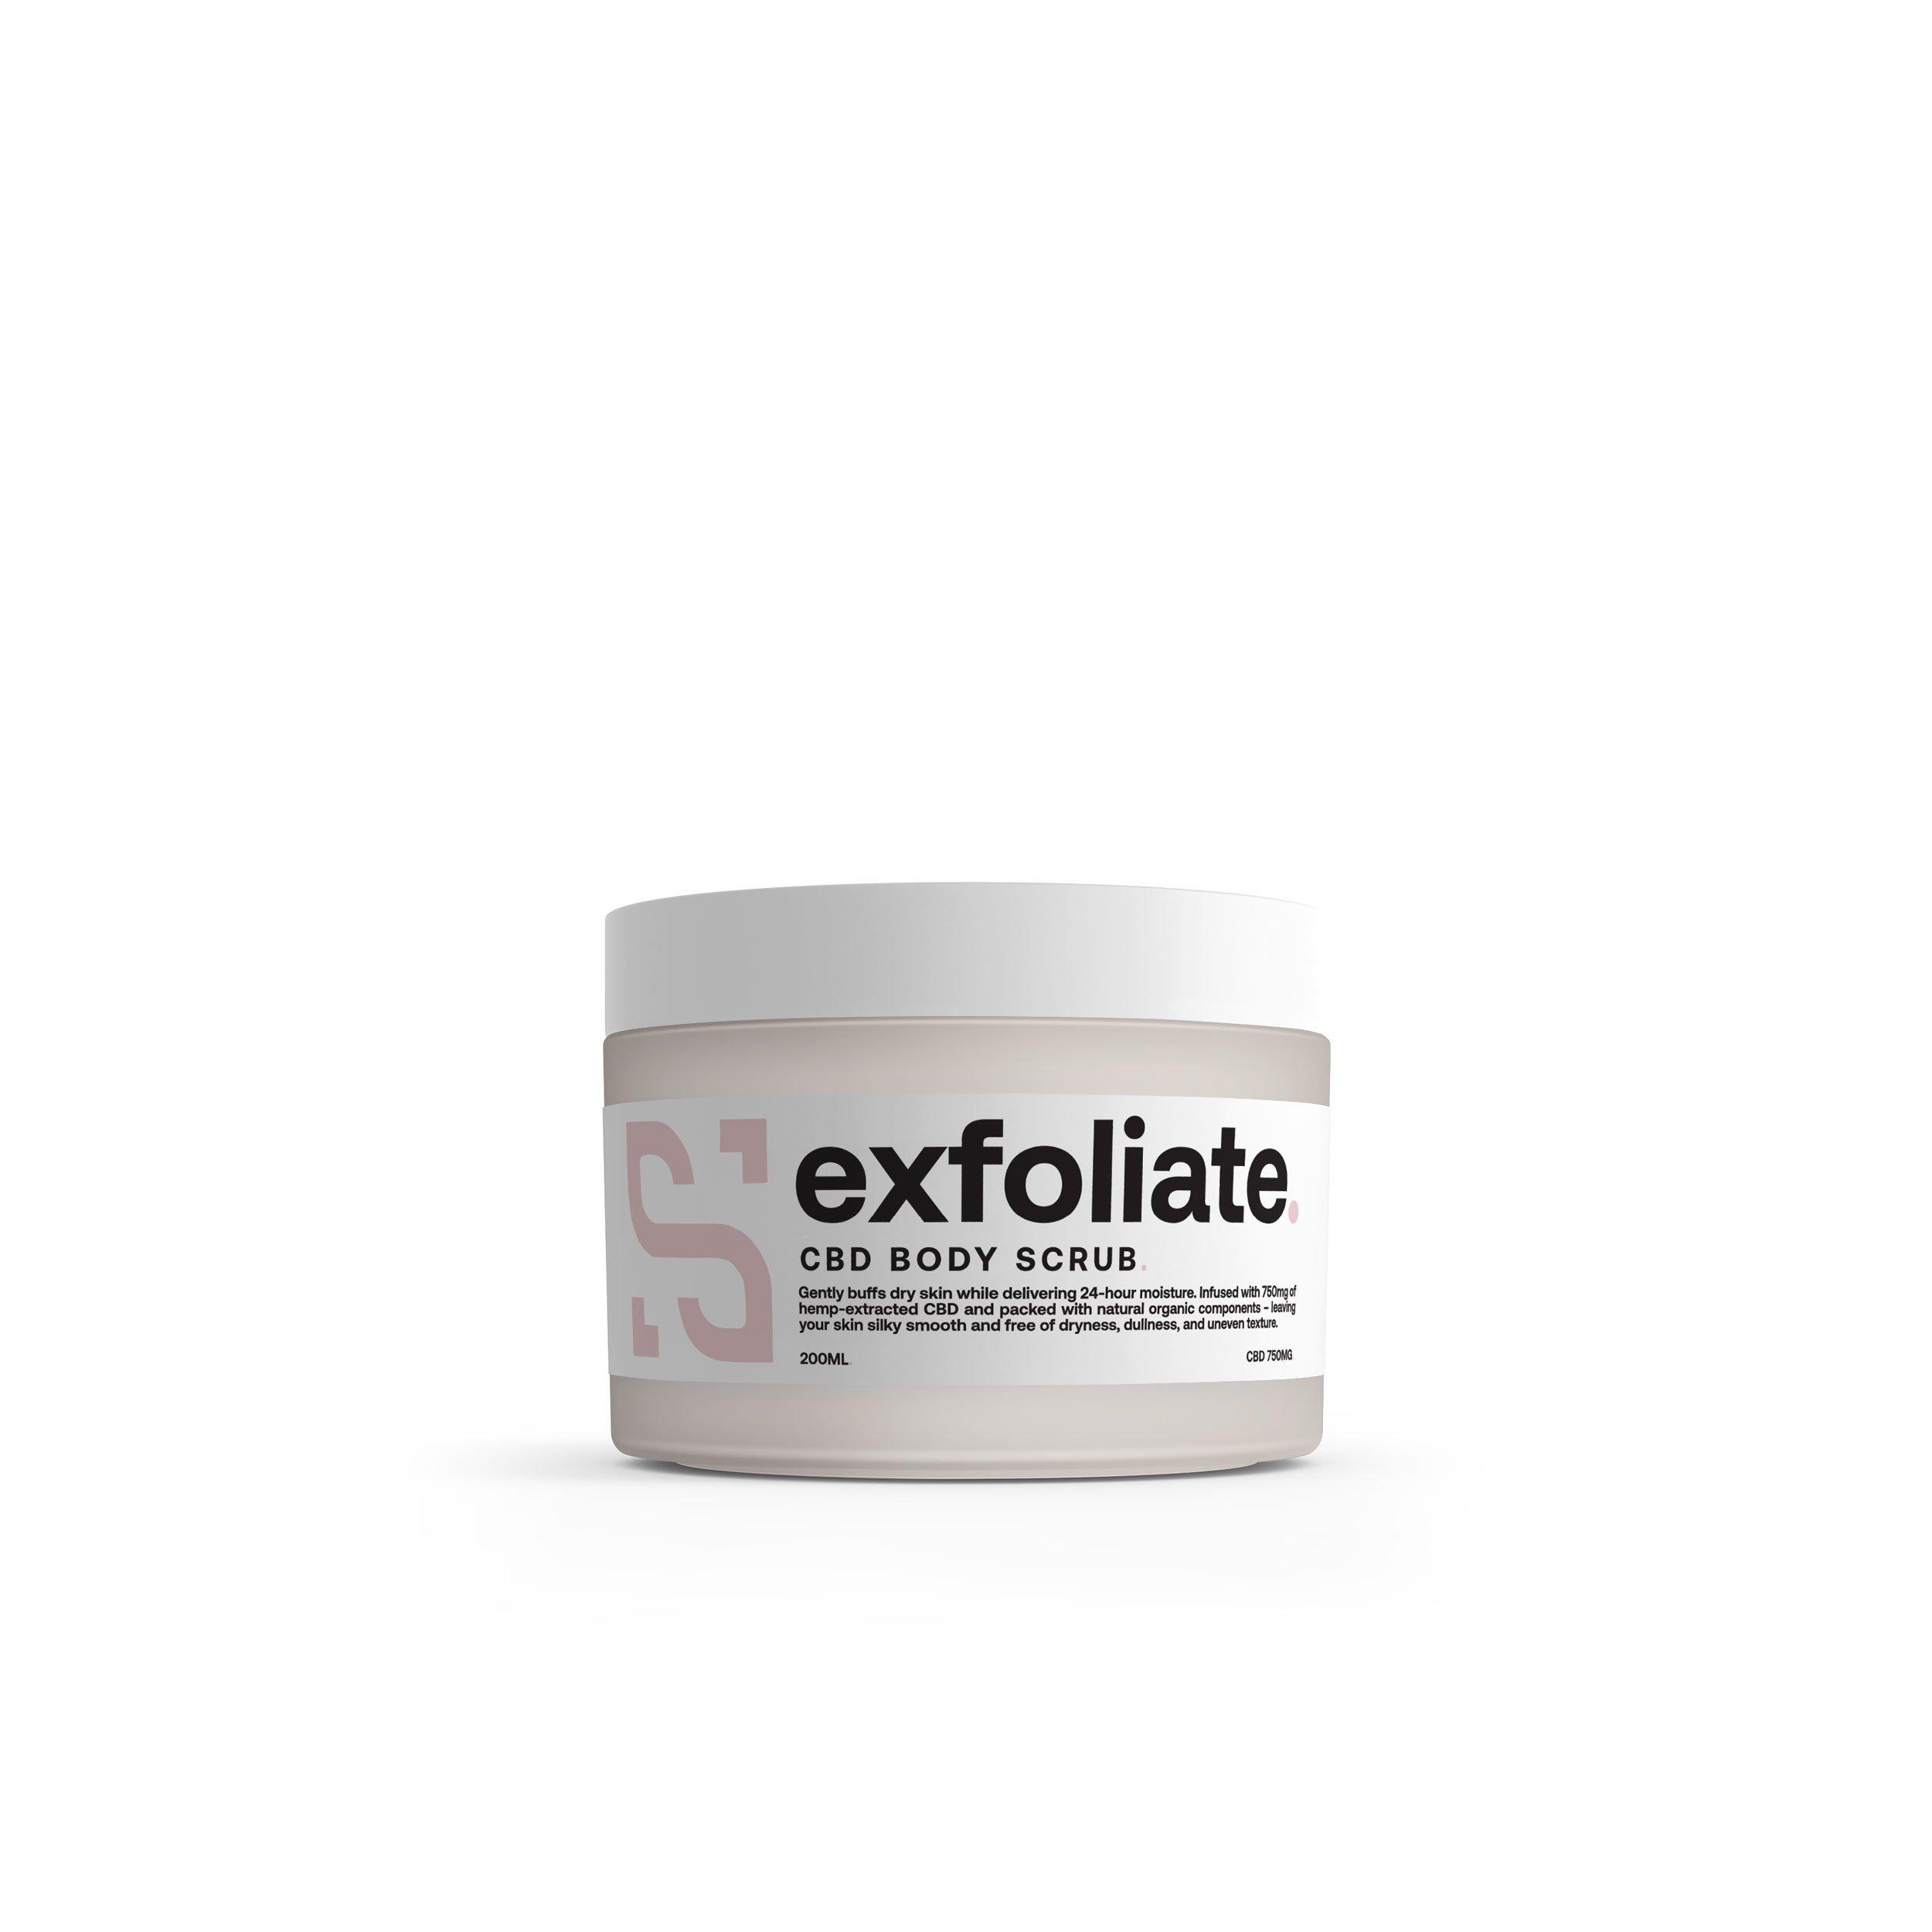 CBD body exfoliate scrub jar